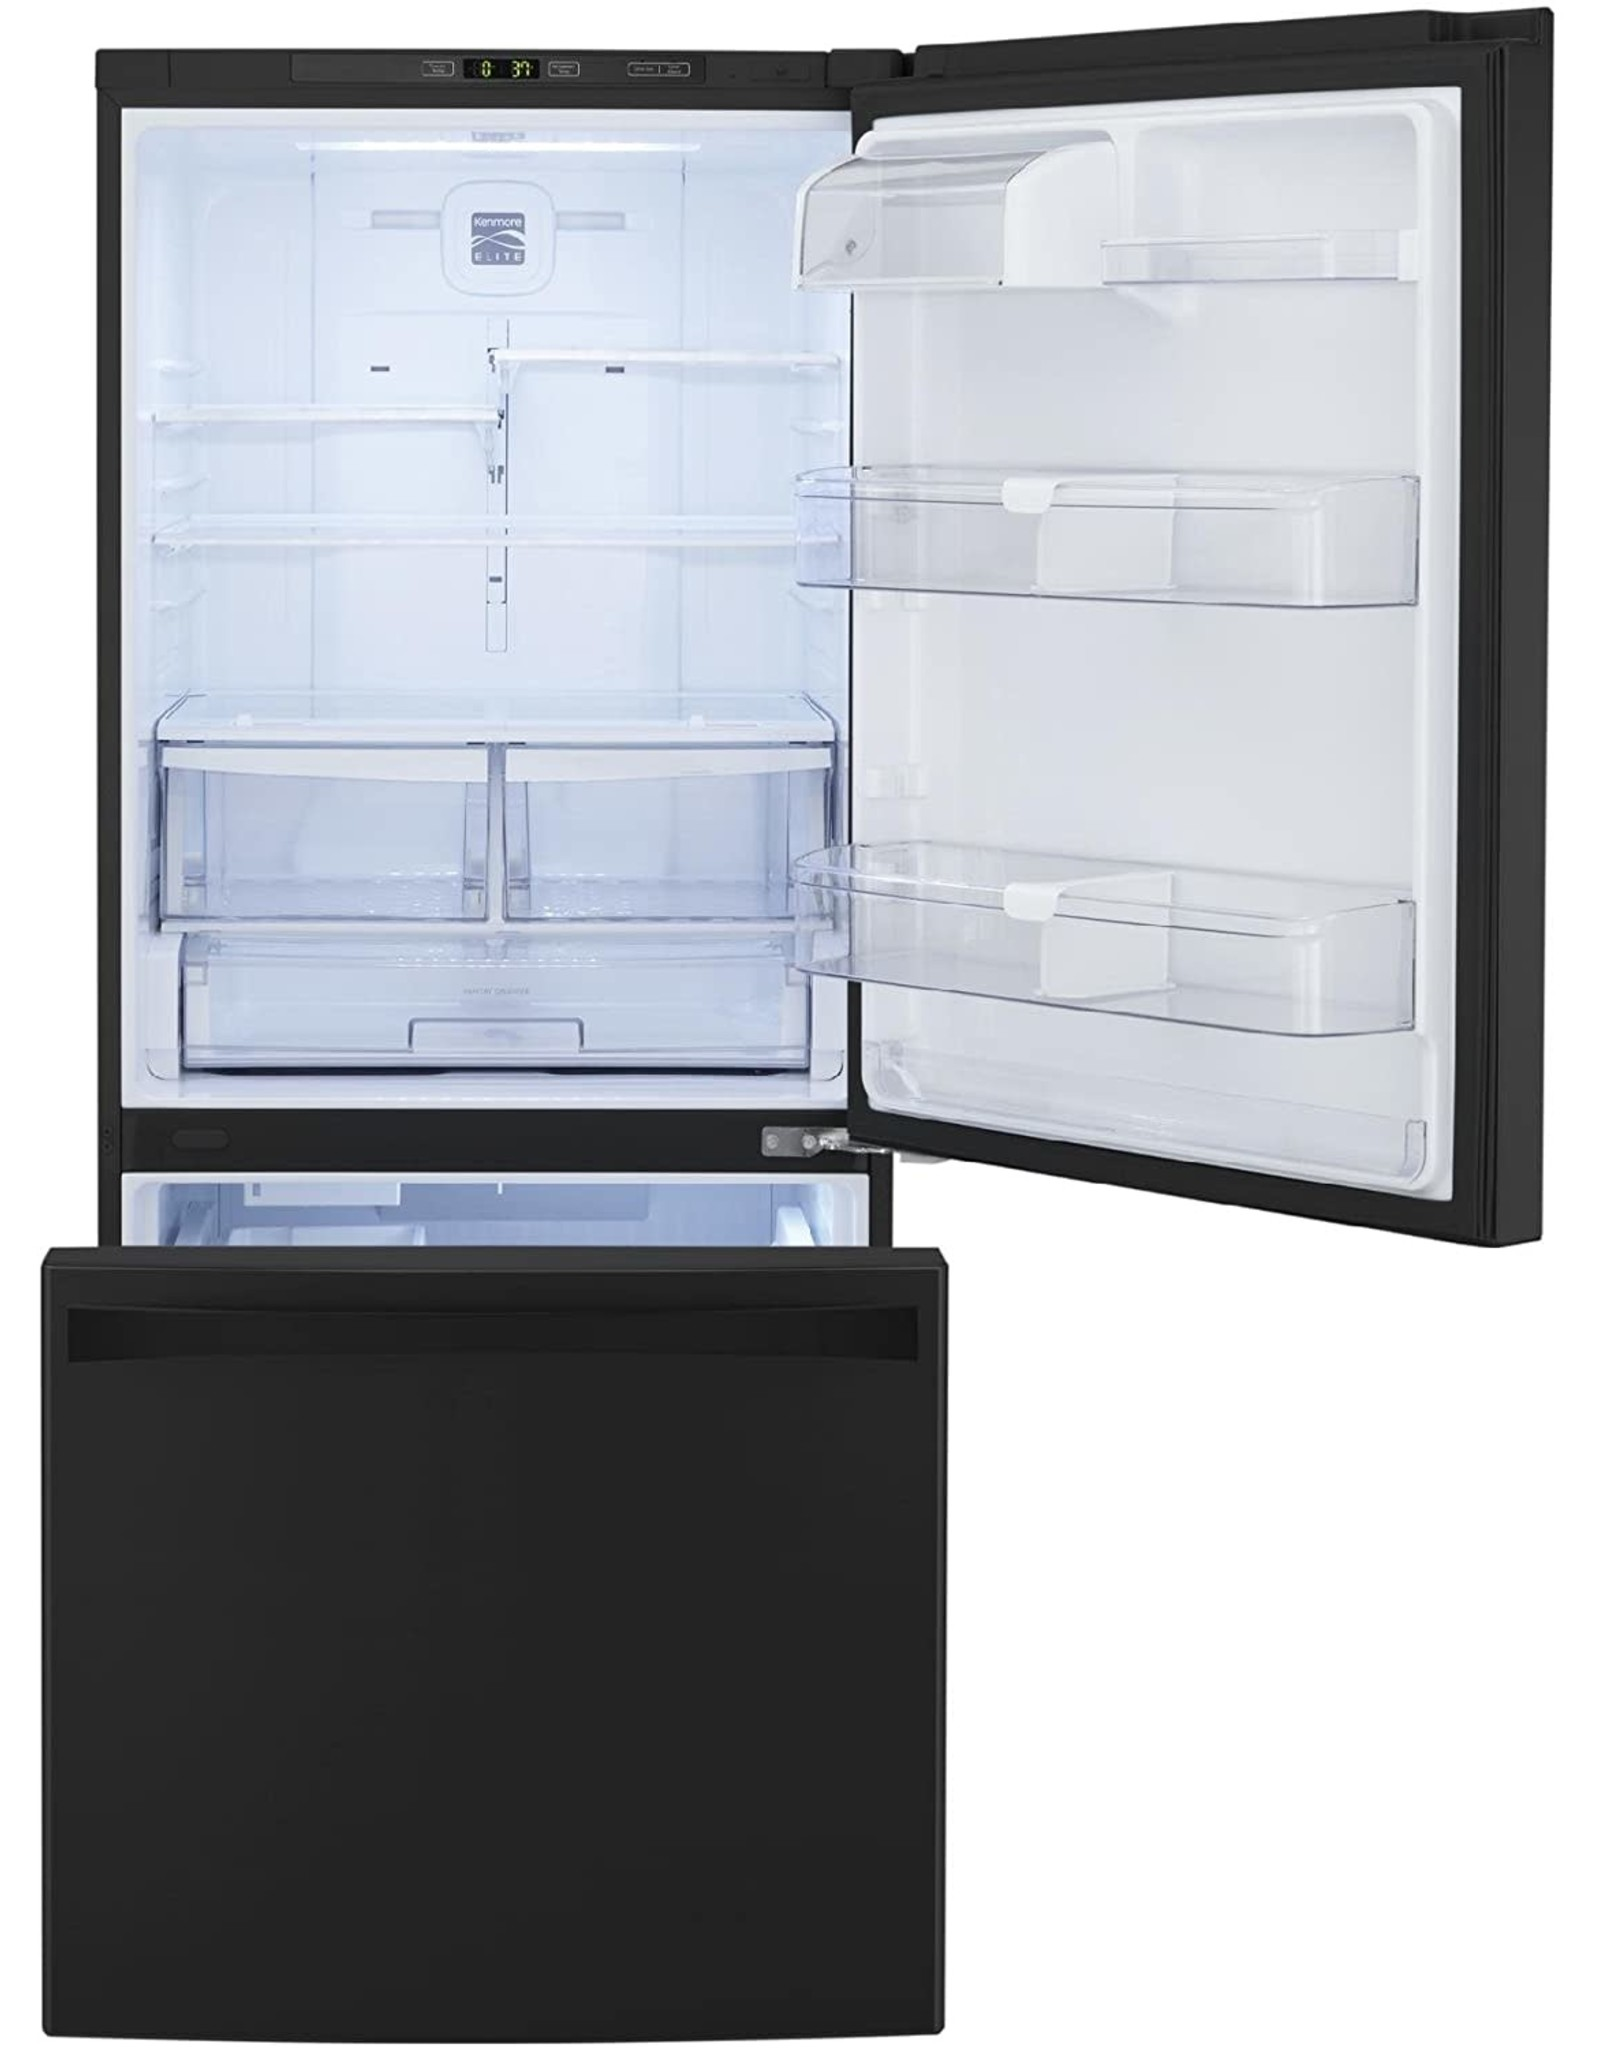 Kenmore Kenmore 79343 22 cu. ft. Wide Bottom Freezer Refrigerator in Stainless Steel